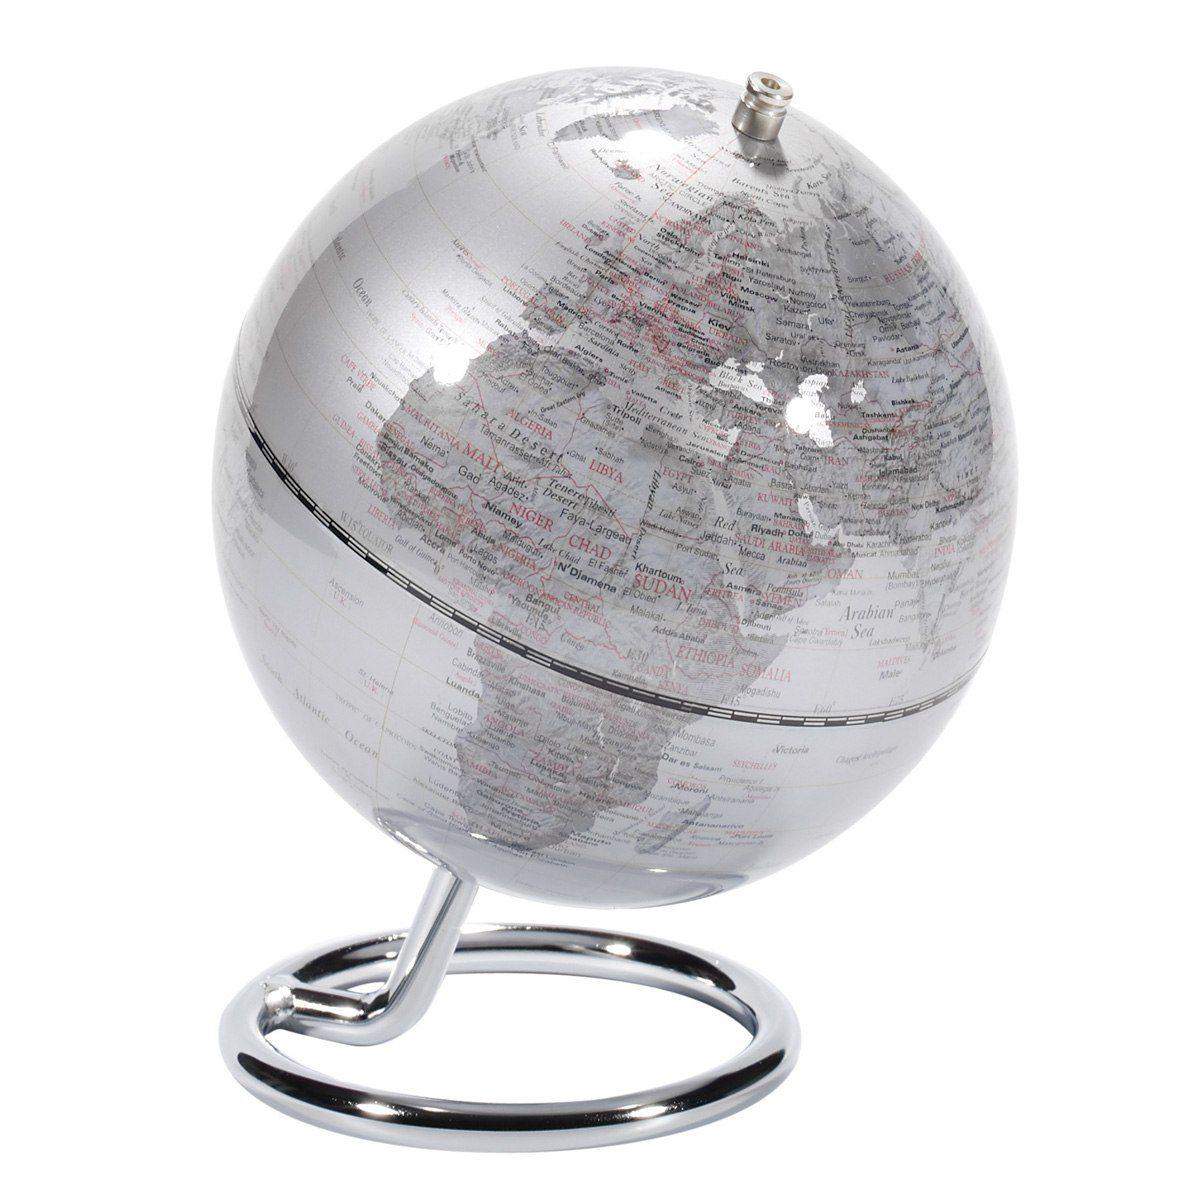 Galilei miniglob